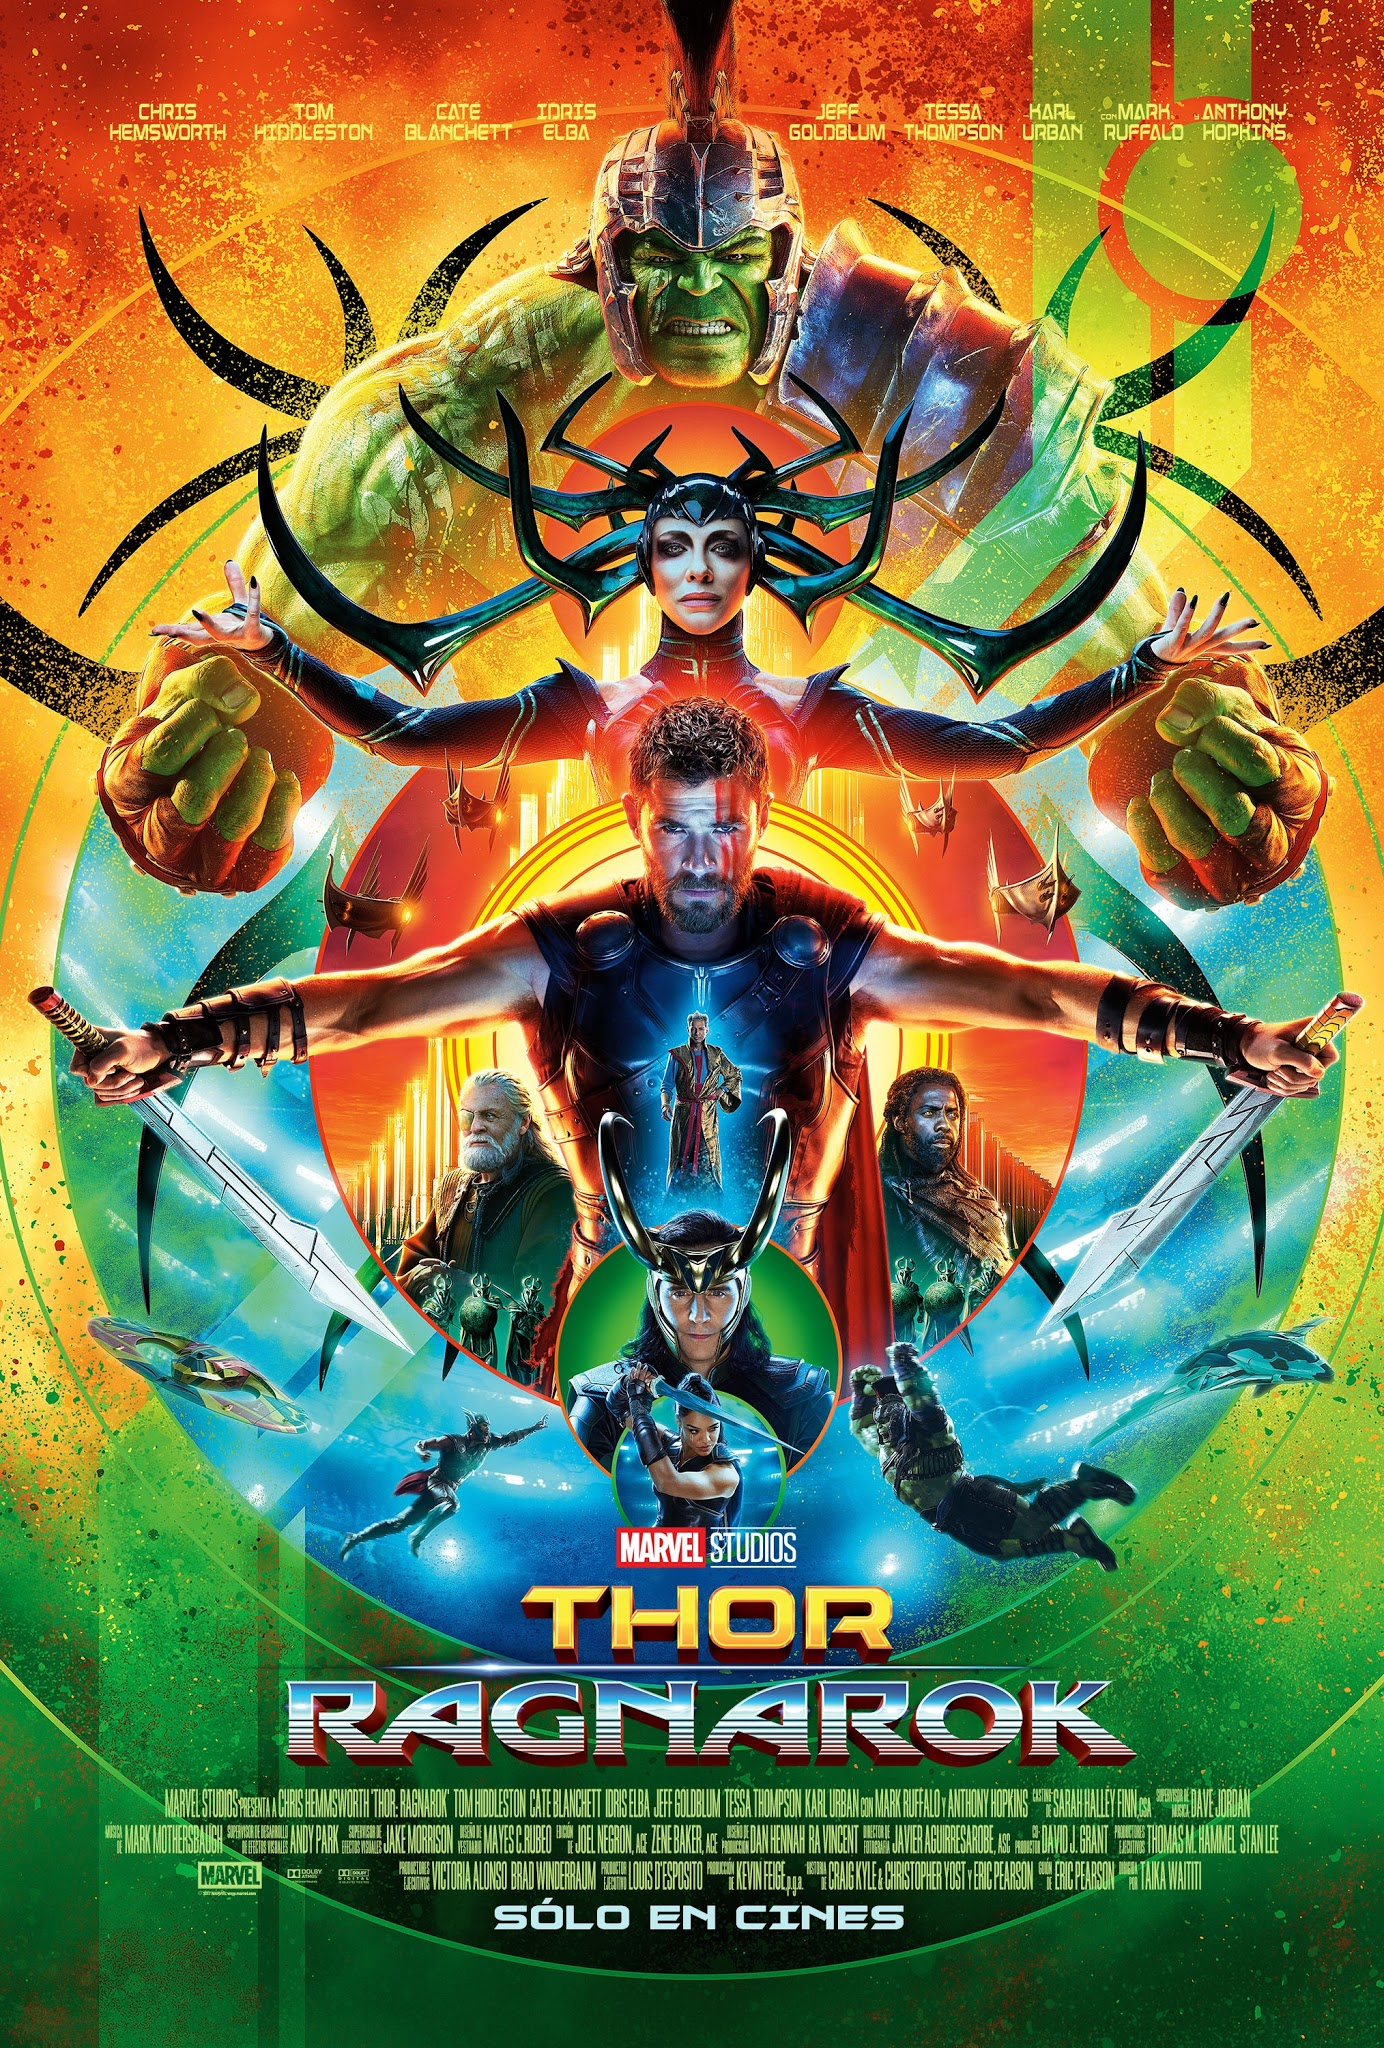 Thor_Ragnarok_Poster_Latino_2_JPosters.jpg